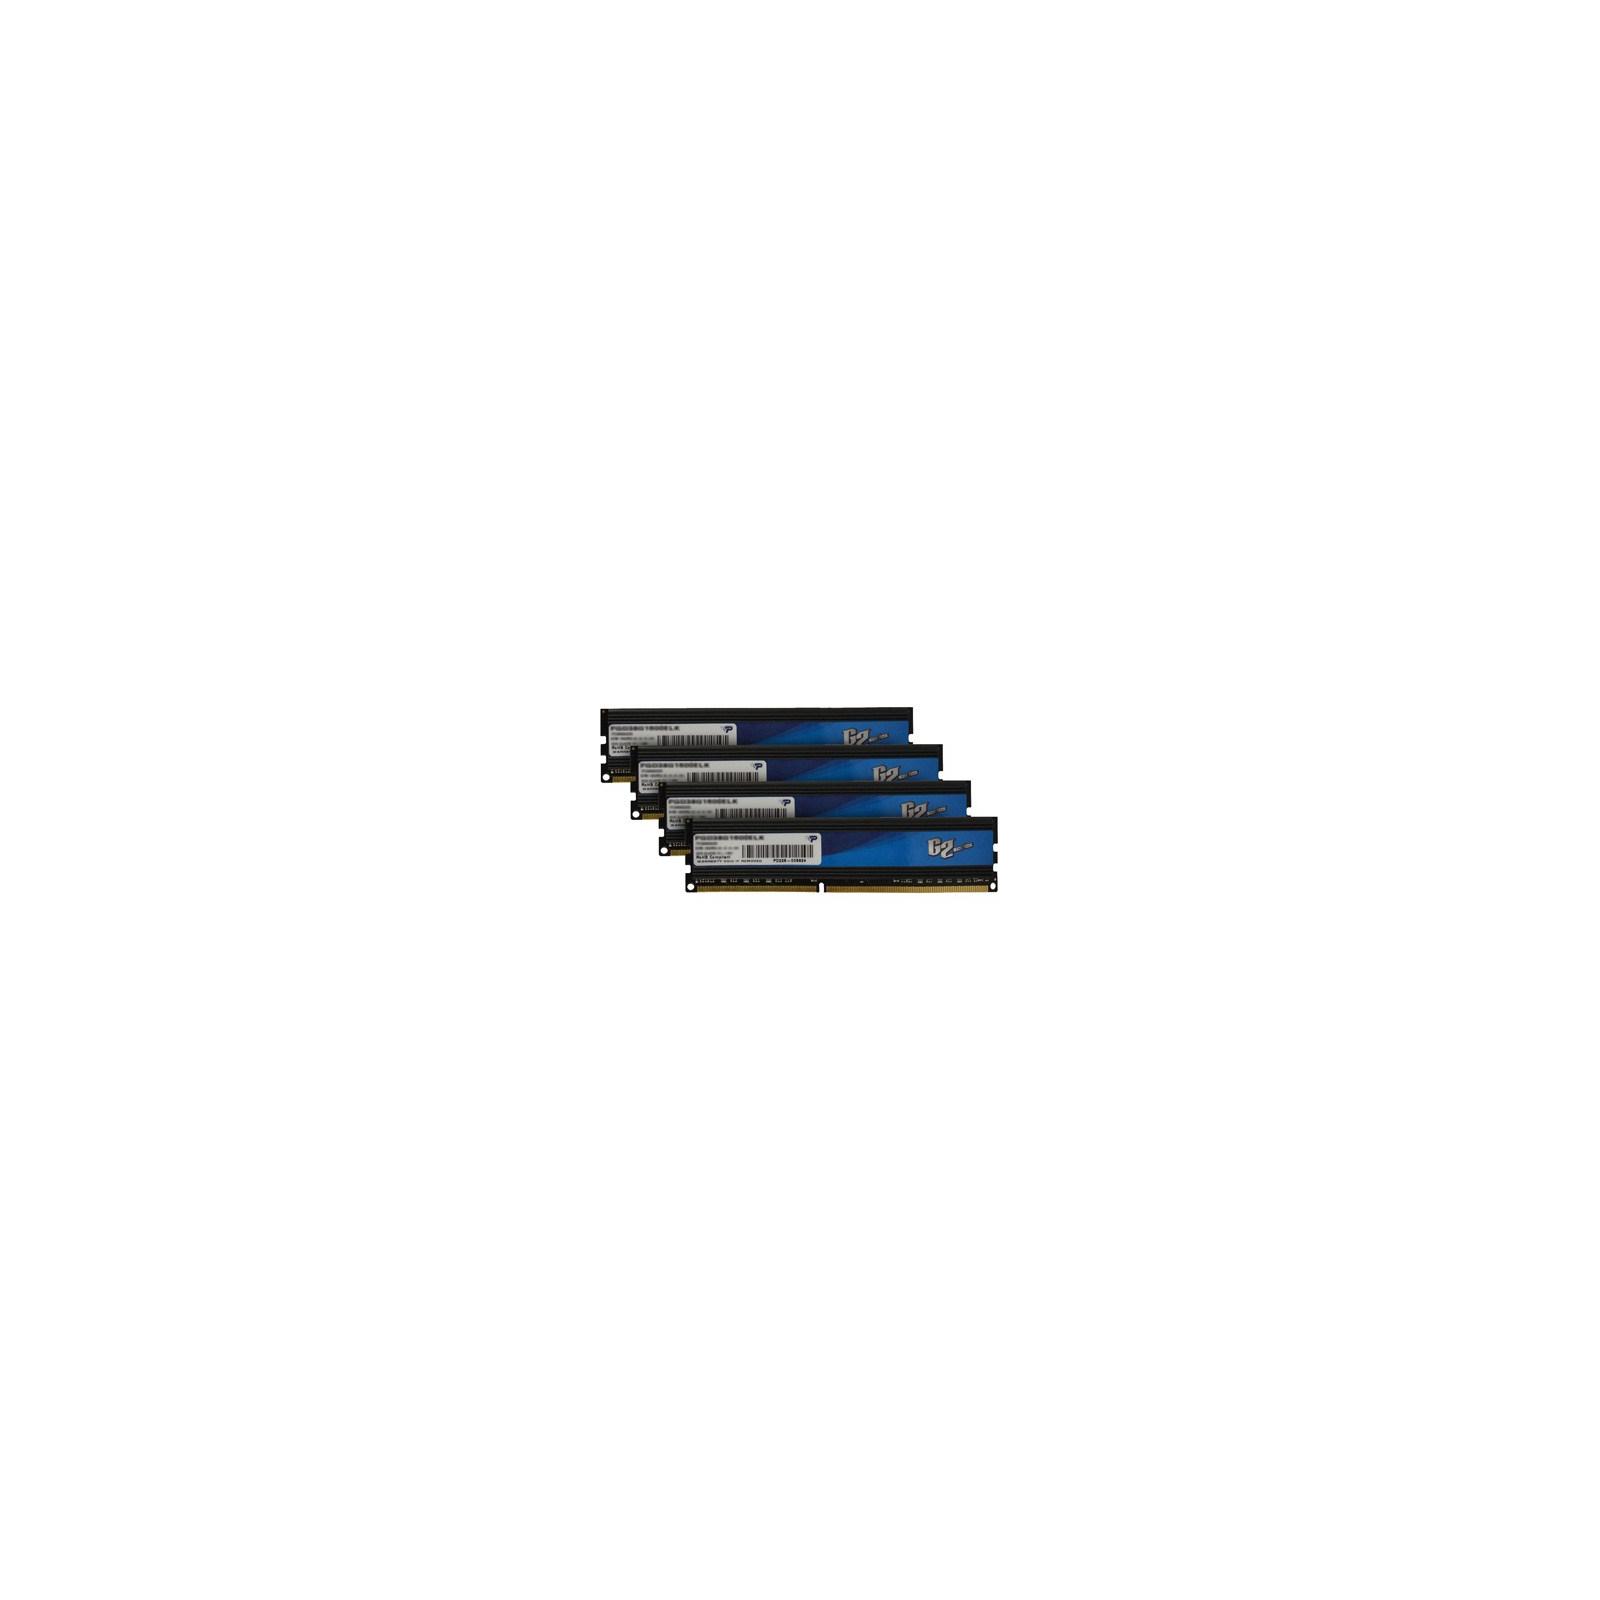 Модуль памяти для компьютера DDR3 16GB (4x4GB) 1600 MHz Patriot (PGQ316G1600ELQK)